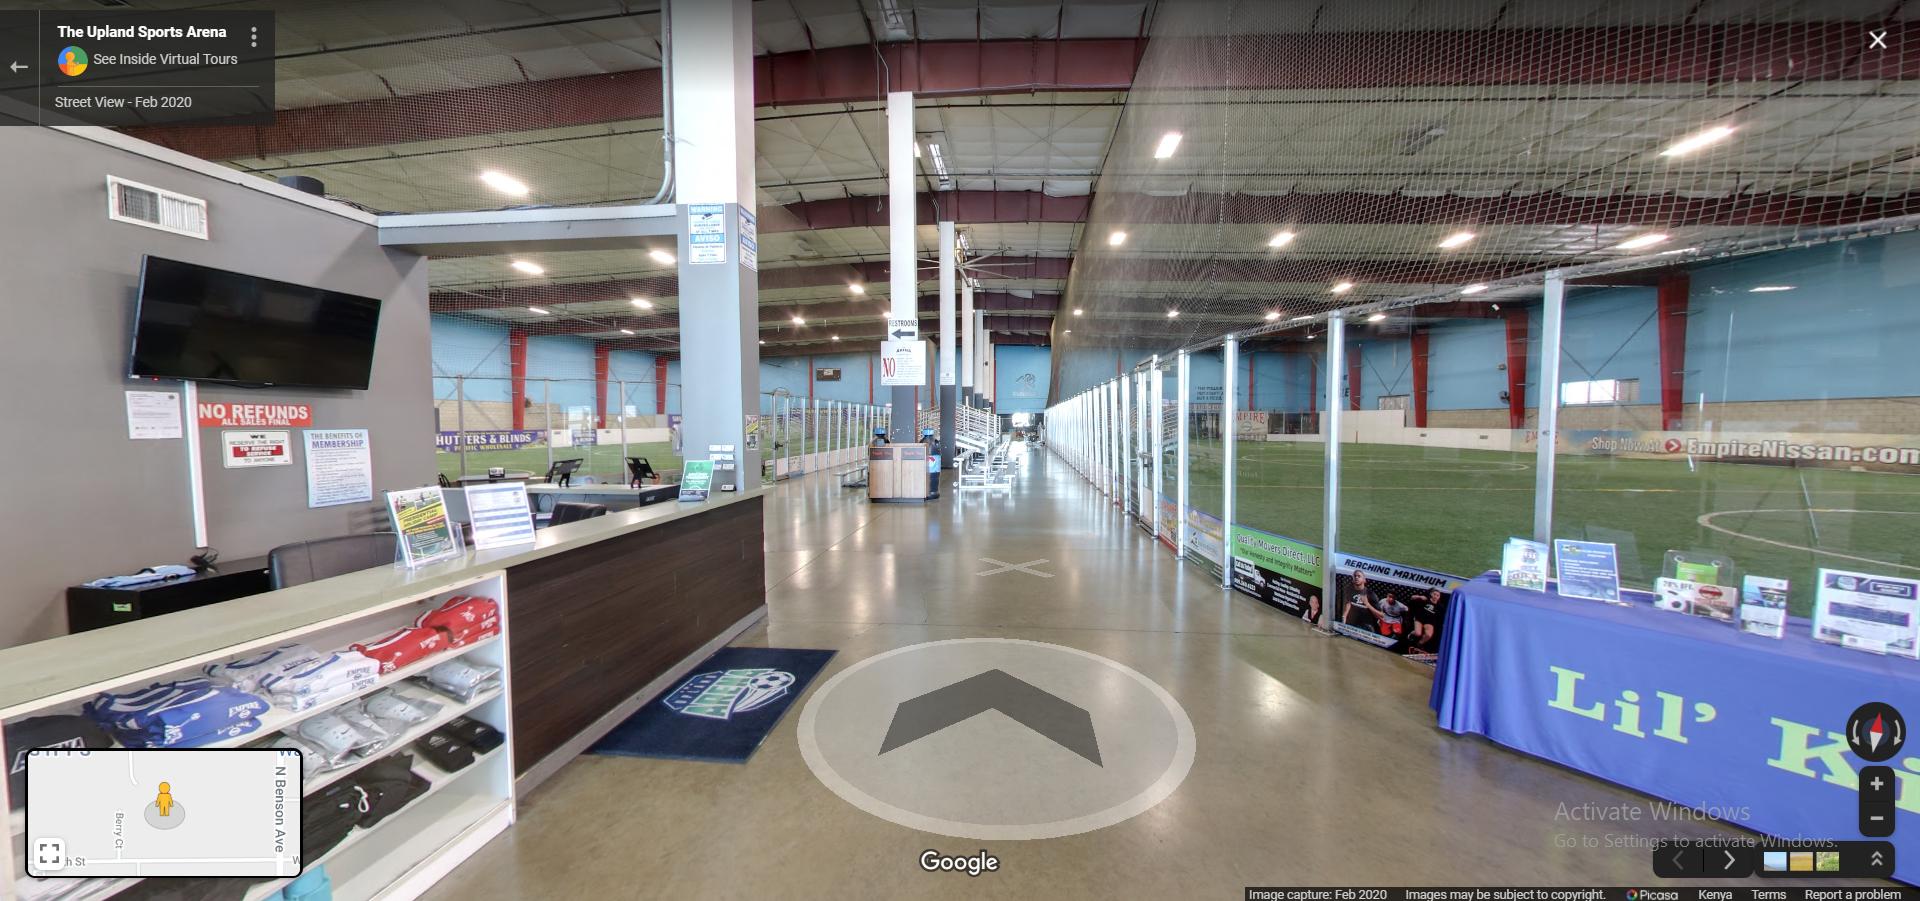 Upland Sports Arena - Upland